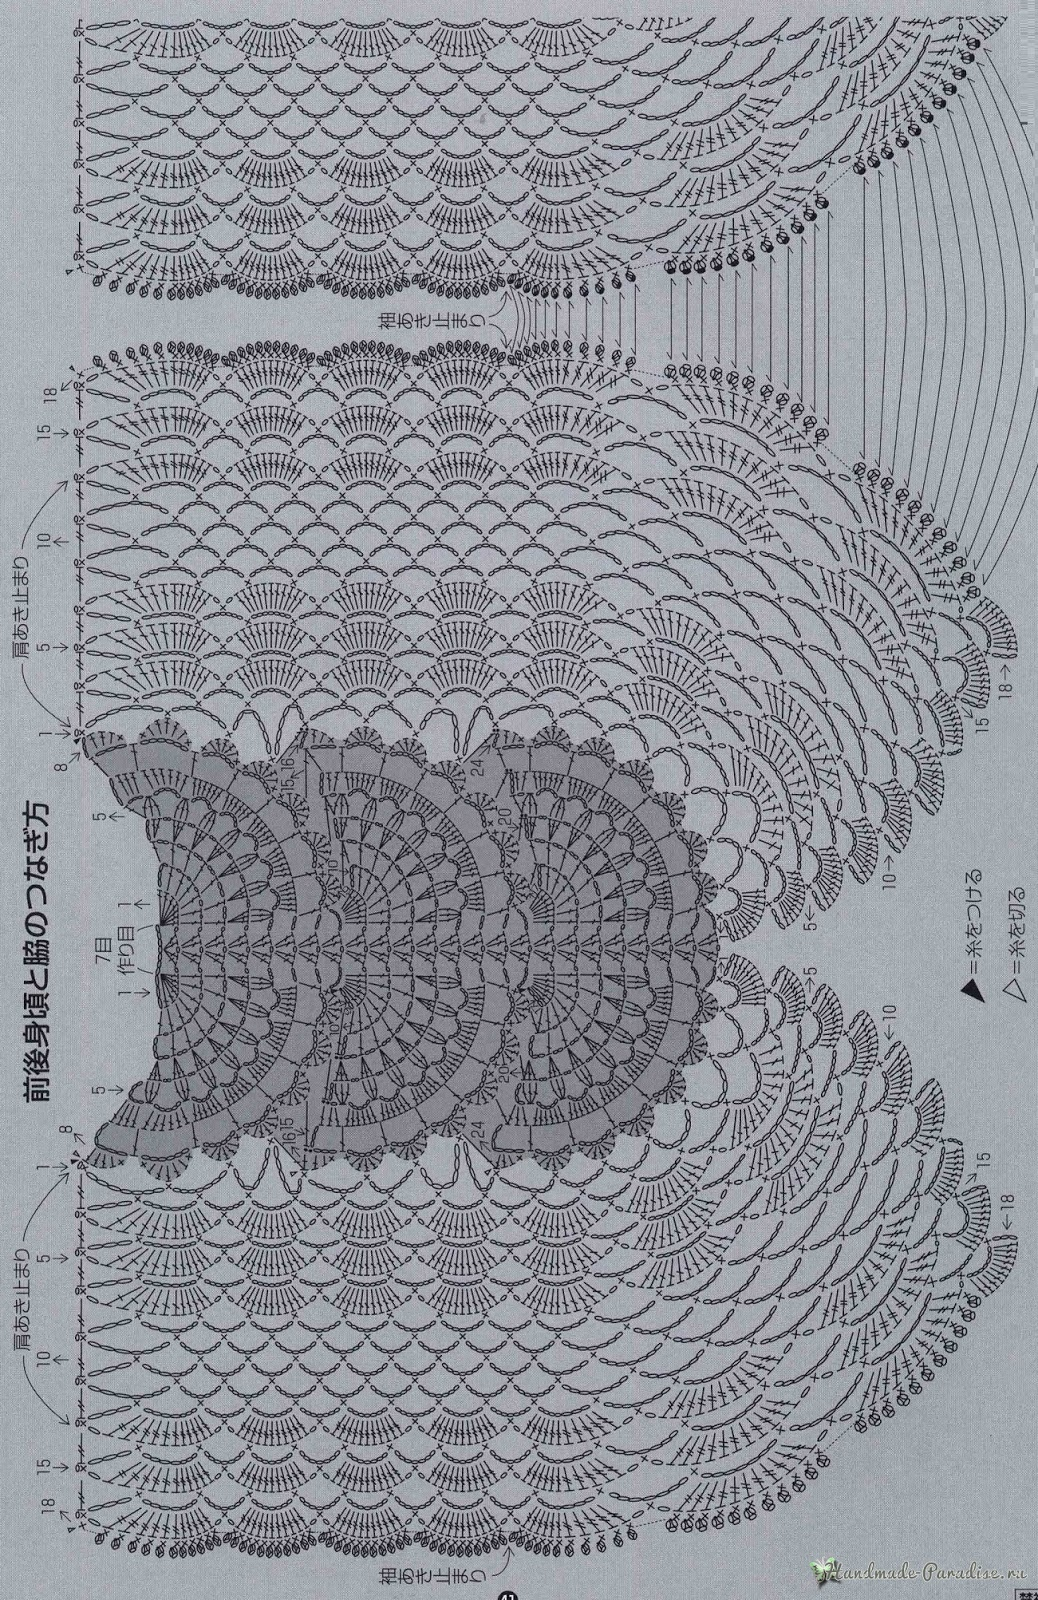 Нарядная блуза крючком. Схема вязания (3)